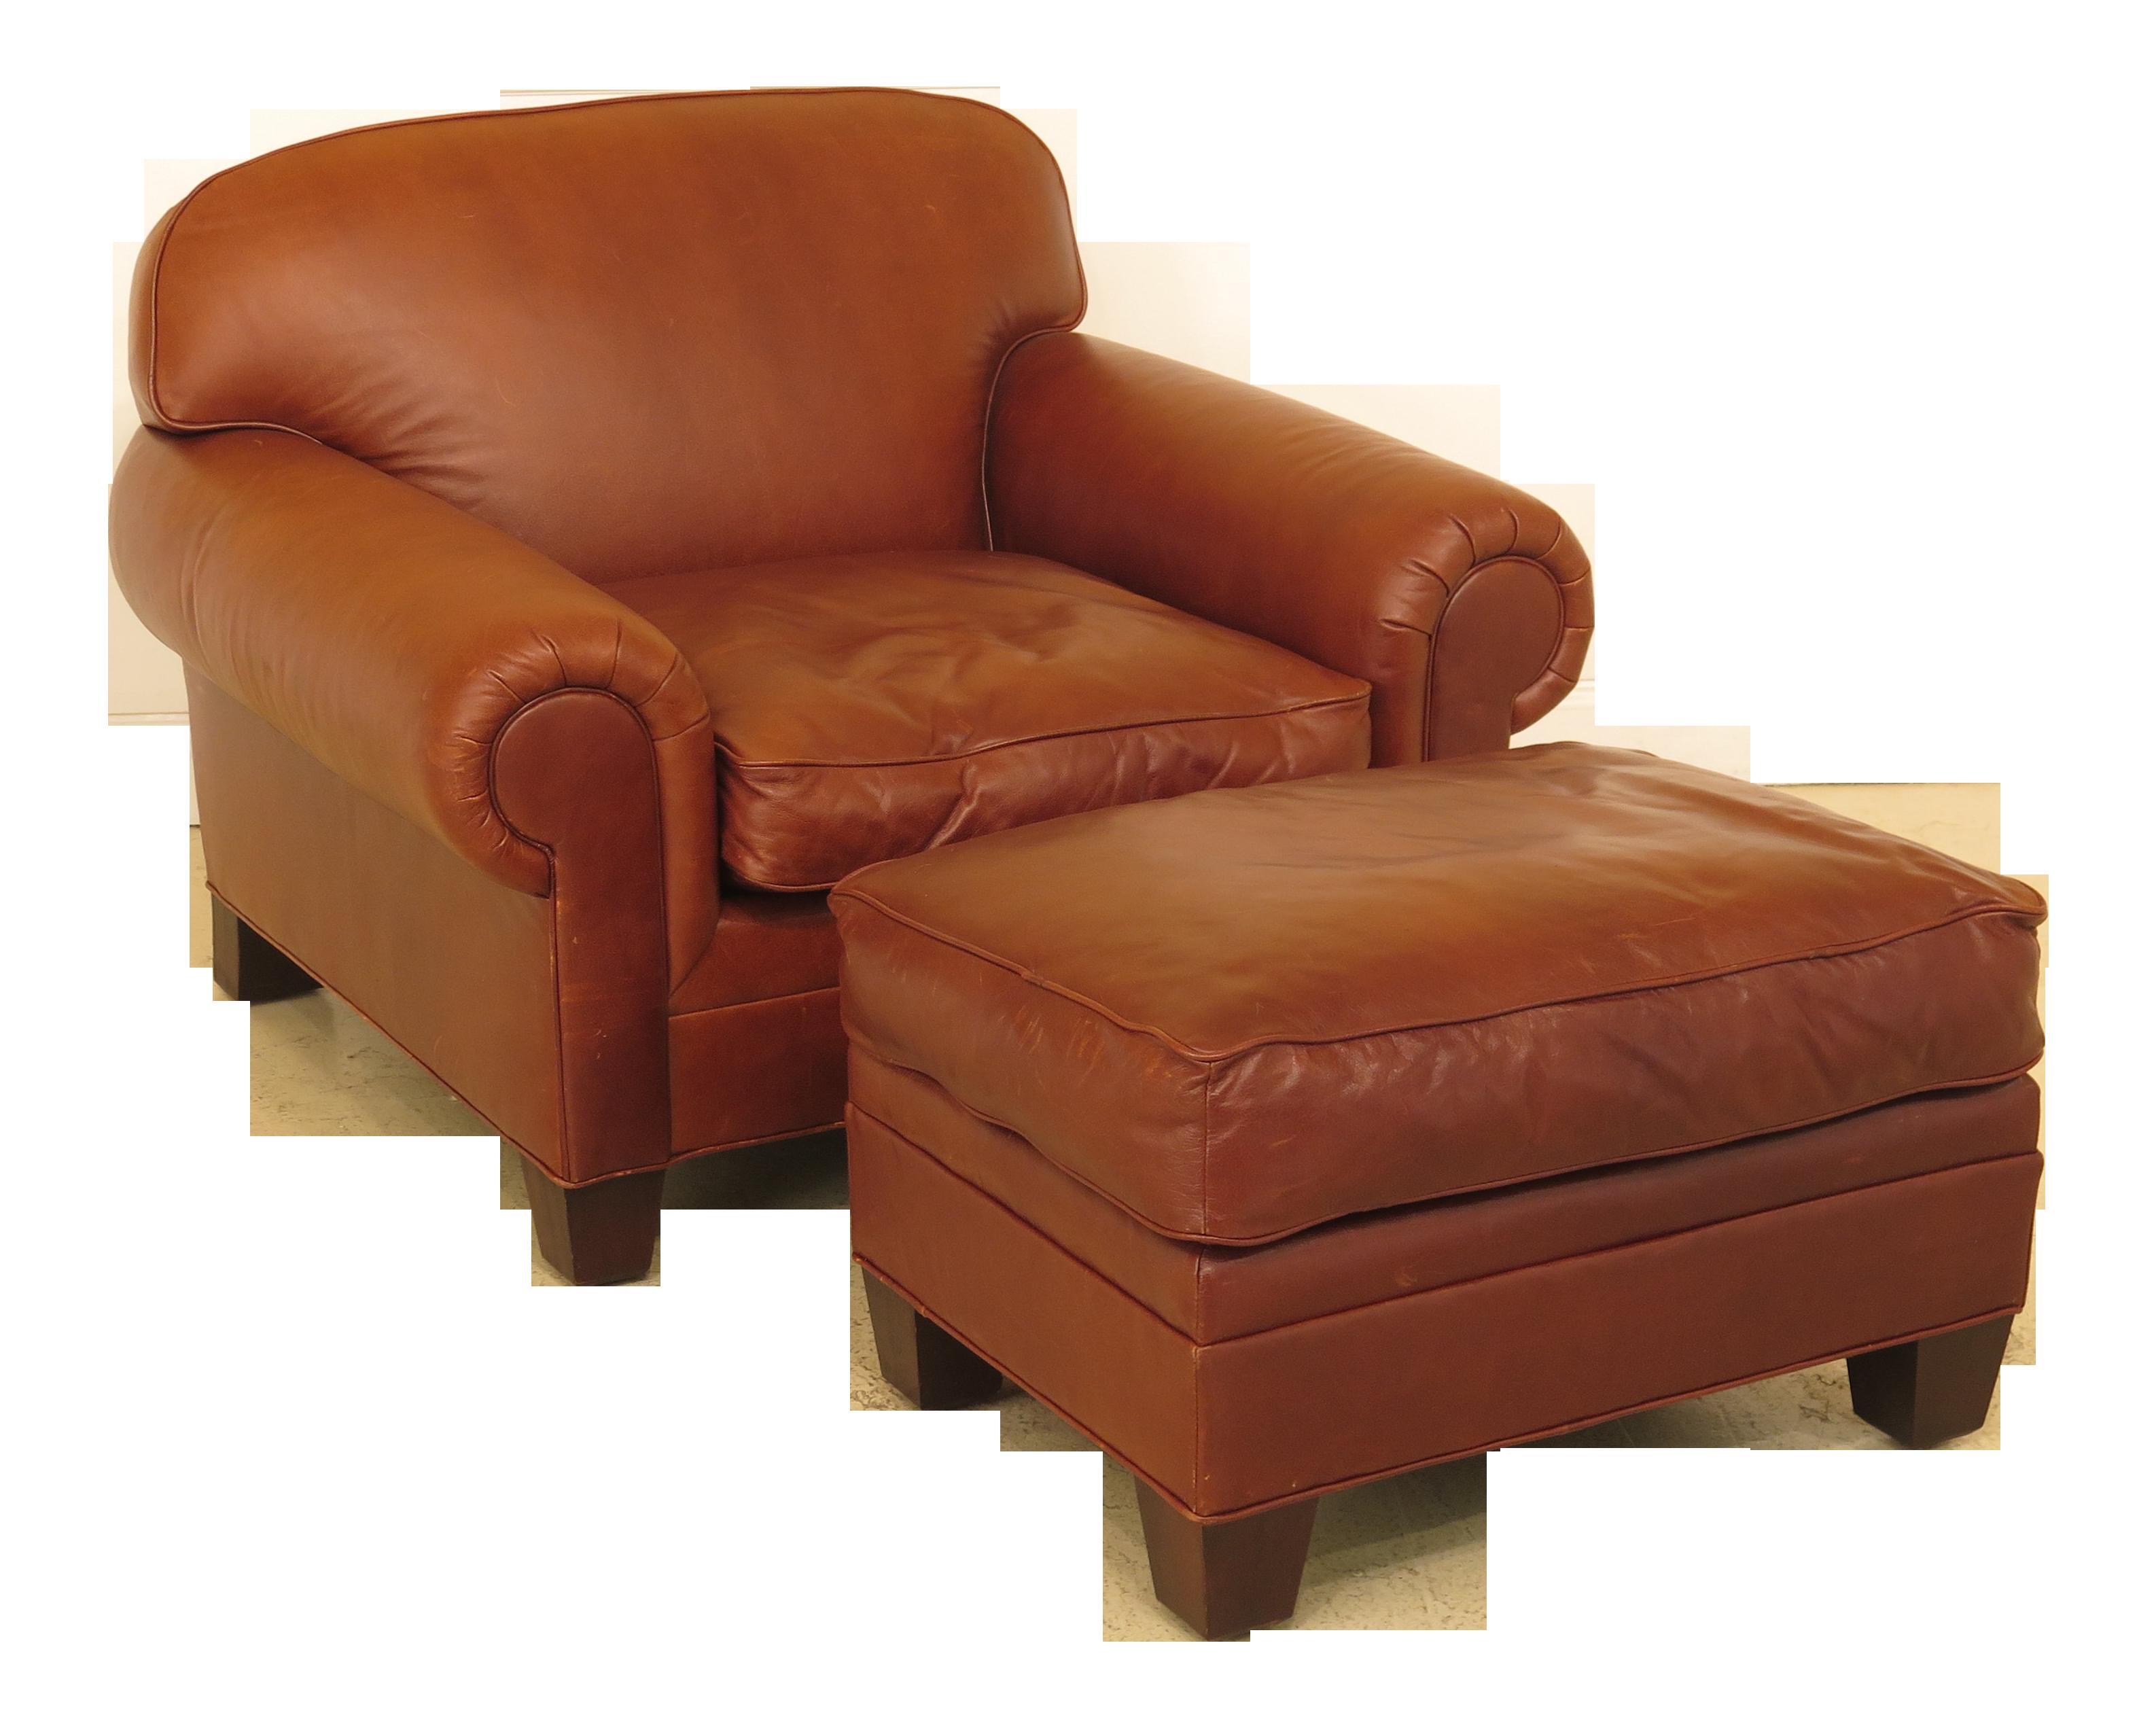 Modern Ralph Lauren Oversized Leather Chair & Ottoman | Chairish